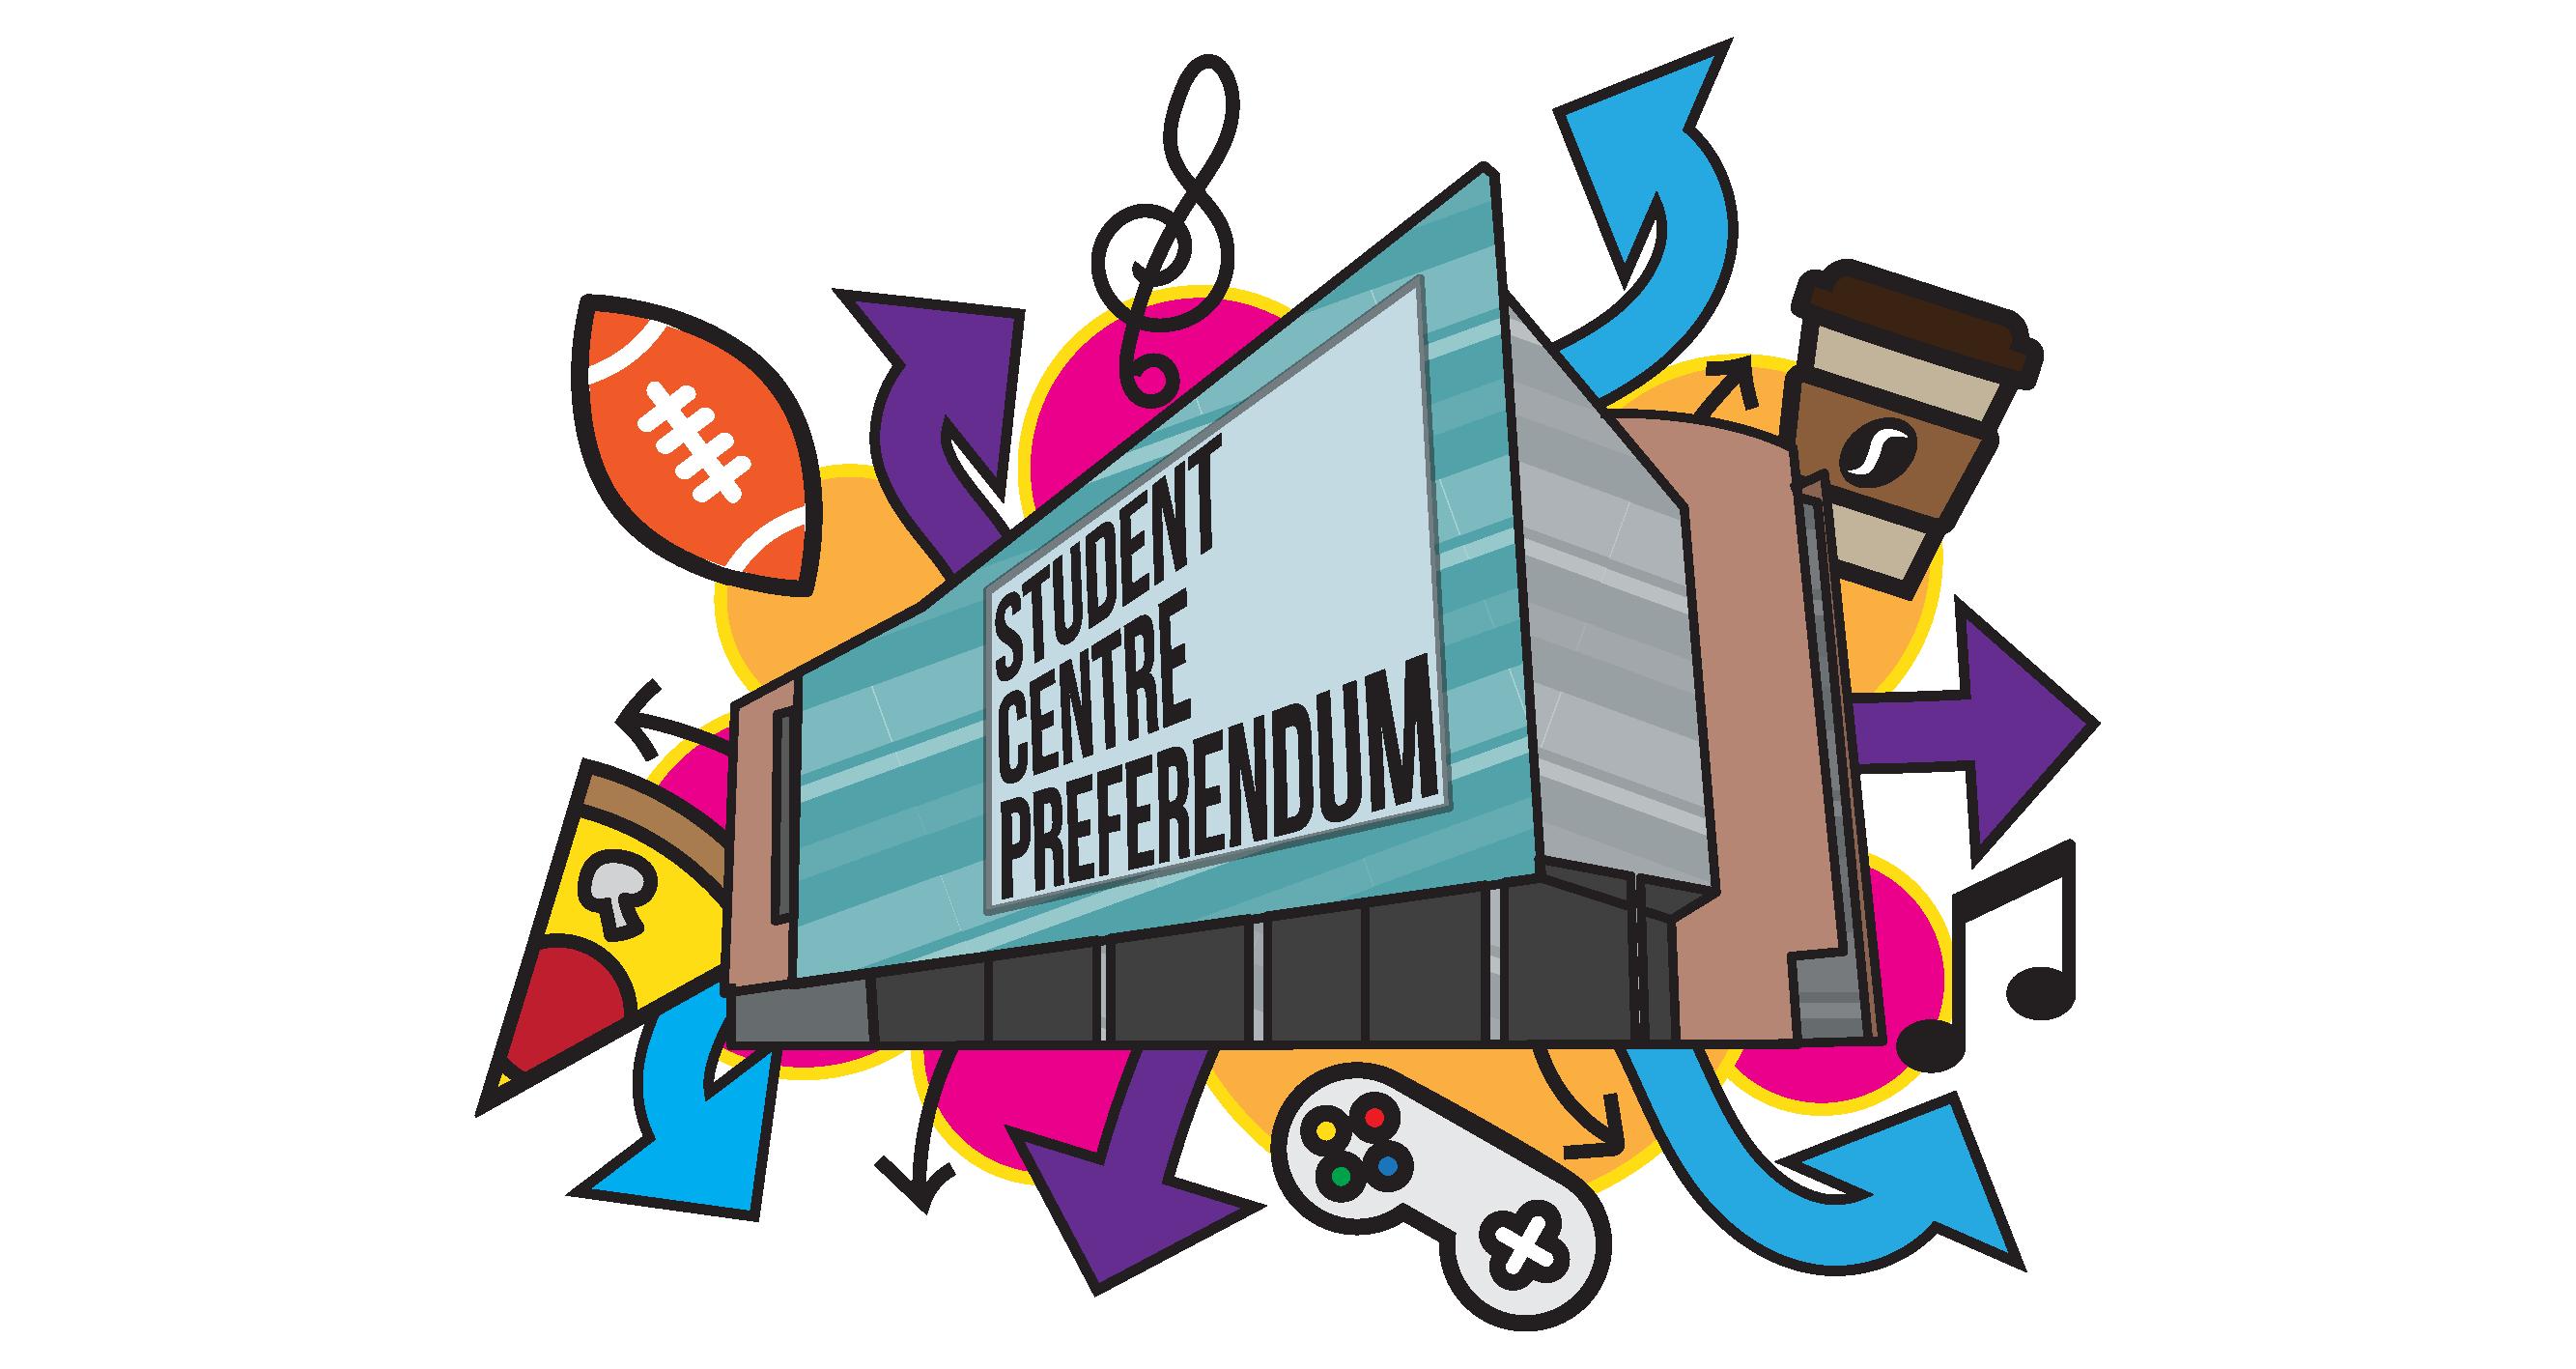 Preferendum Campaign